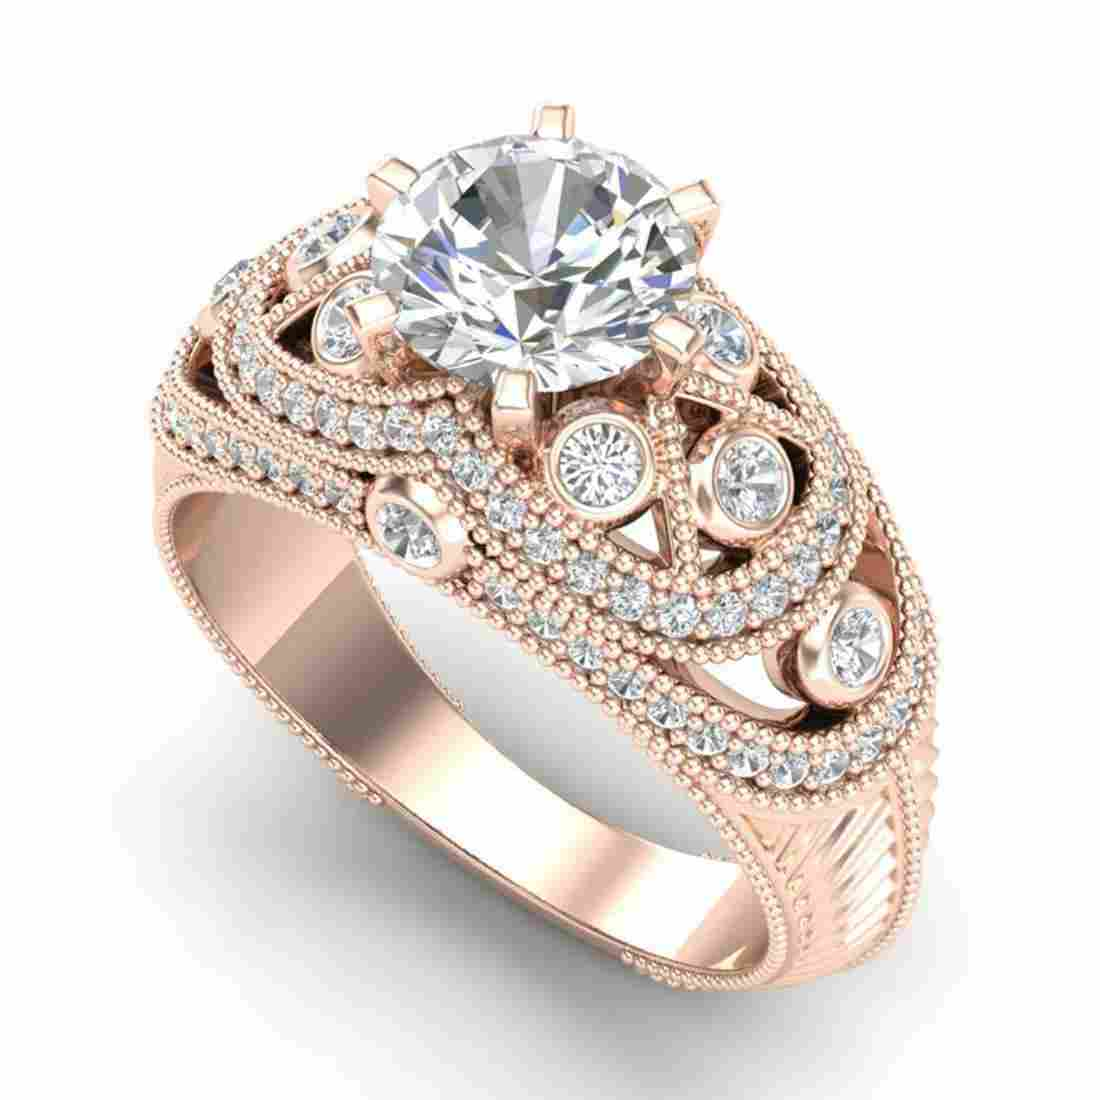 2 ctw VS/SI Diamond Solitaire Art Deco Ring 18K Rose